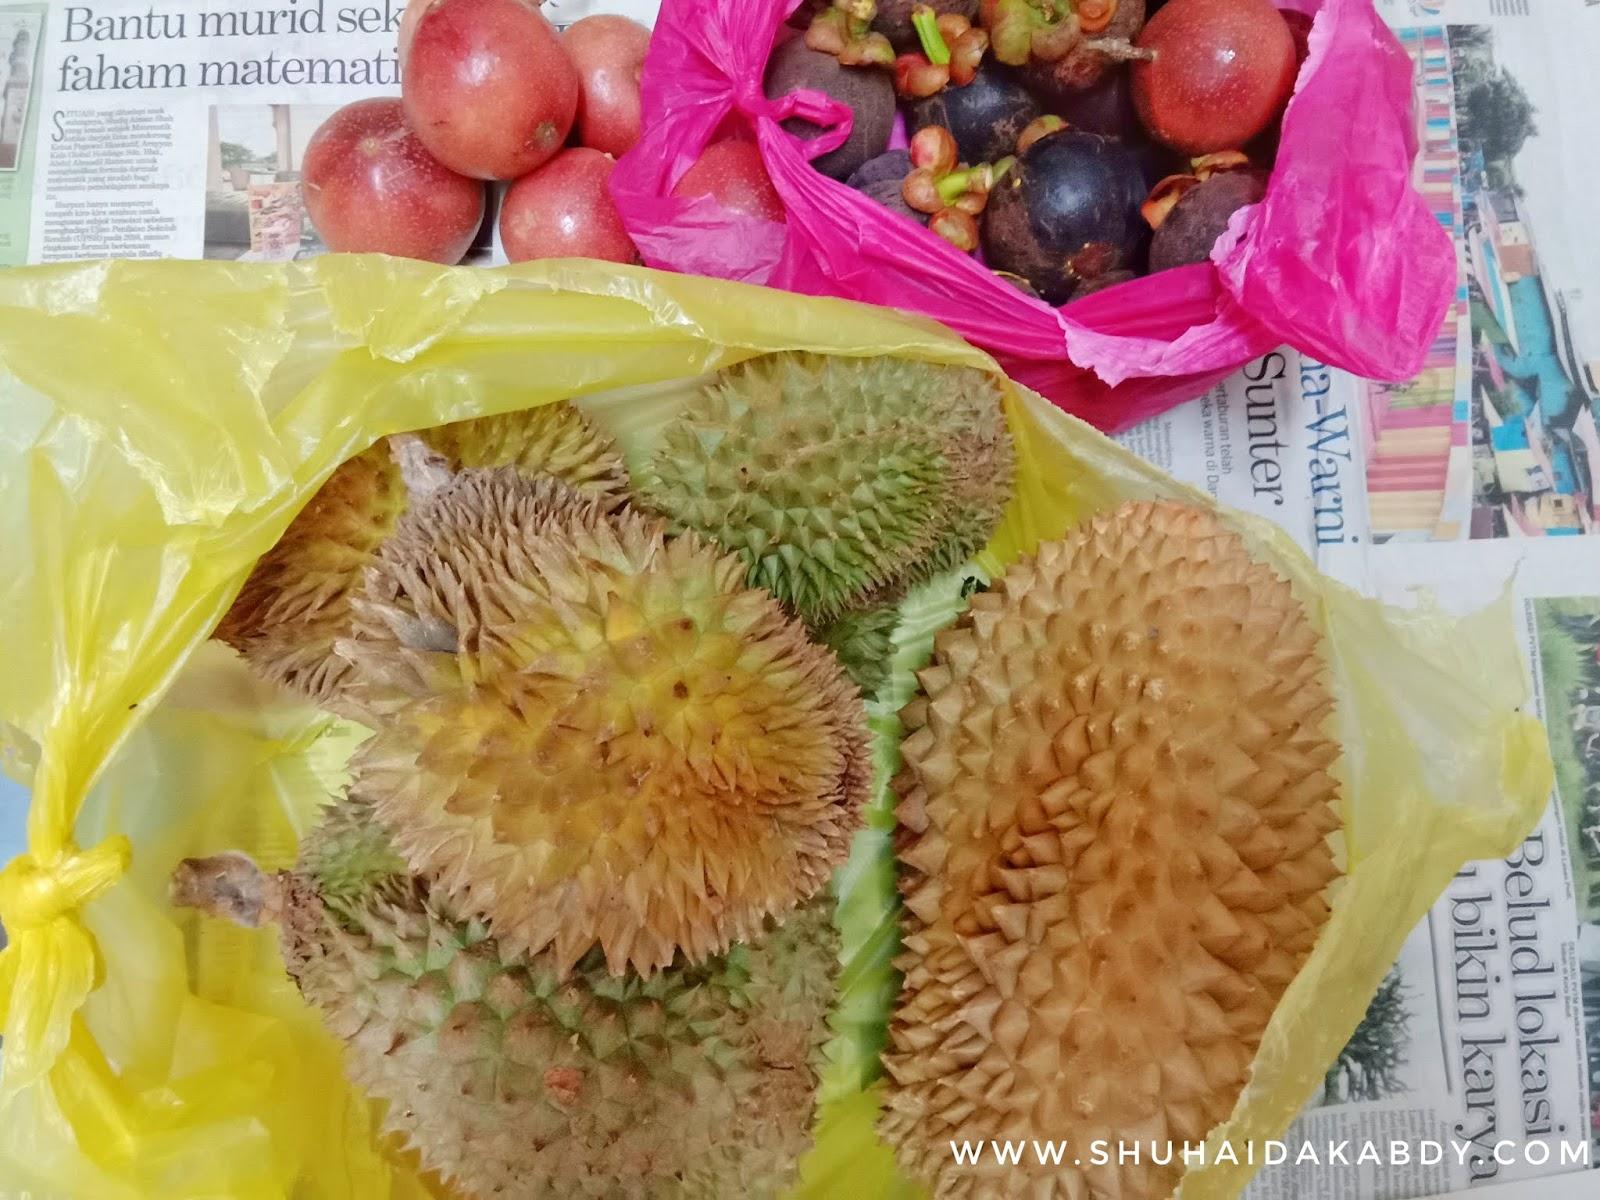 Buah Bermusim, Durian, Durian Batu Kurau